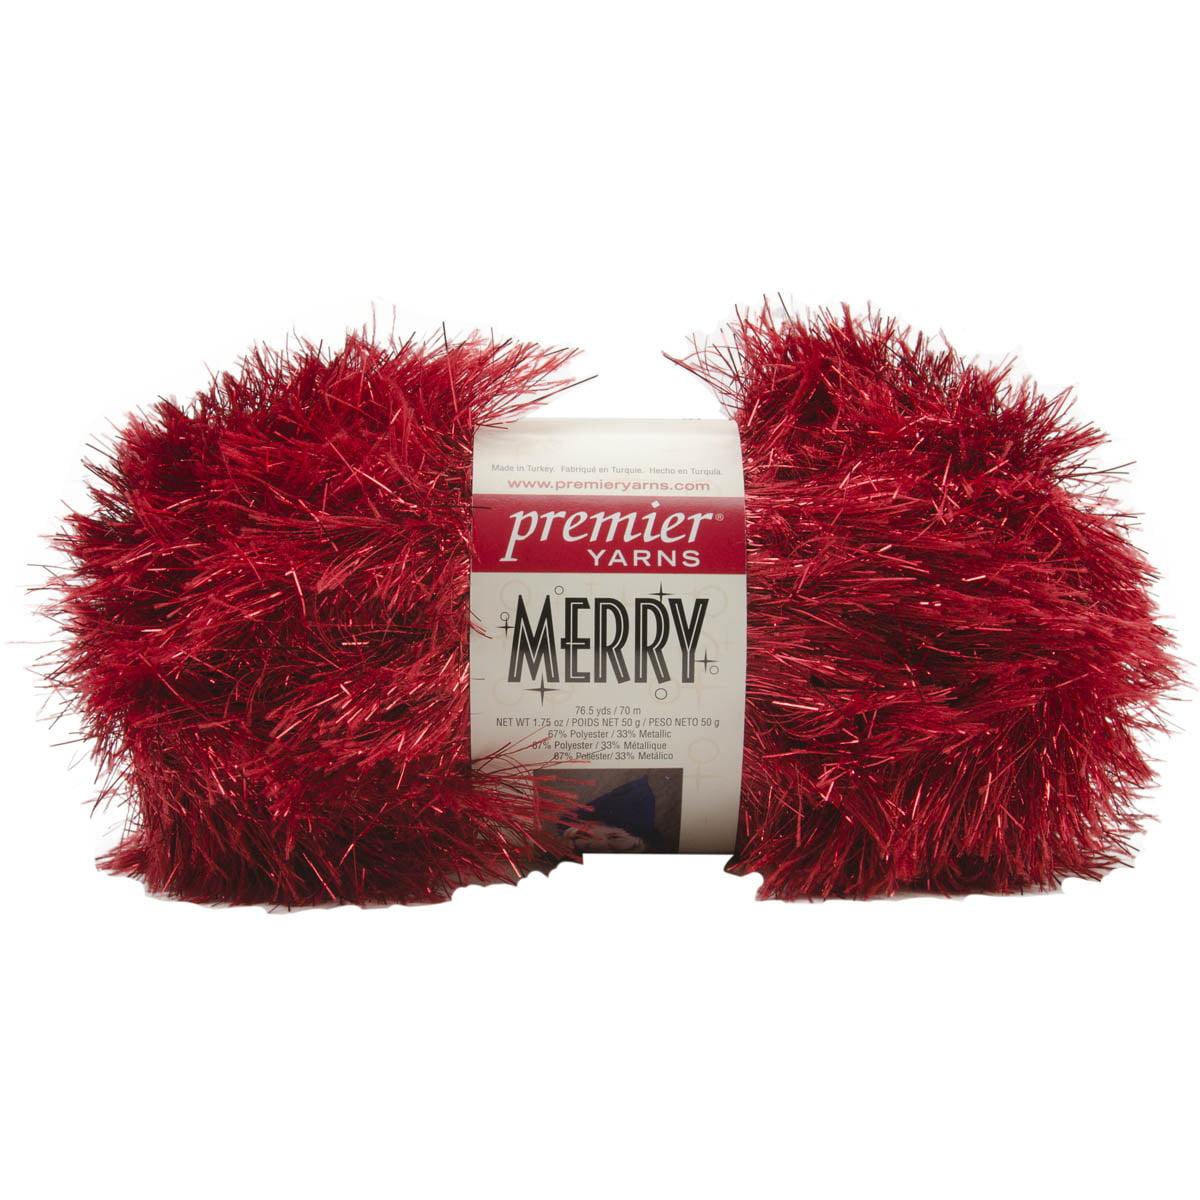 Merry Yarn-Red Globes